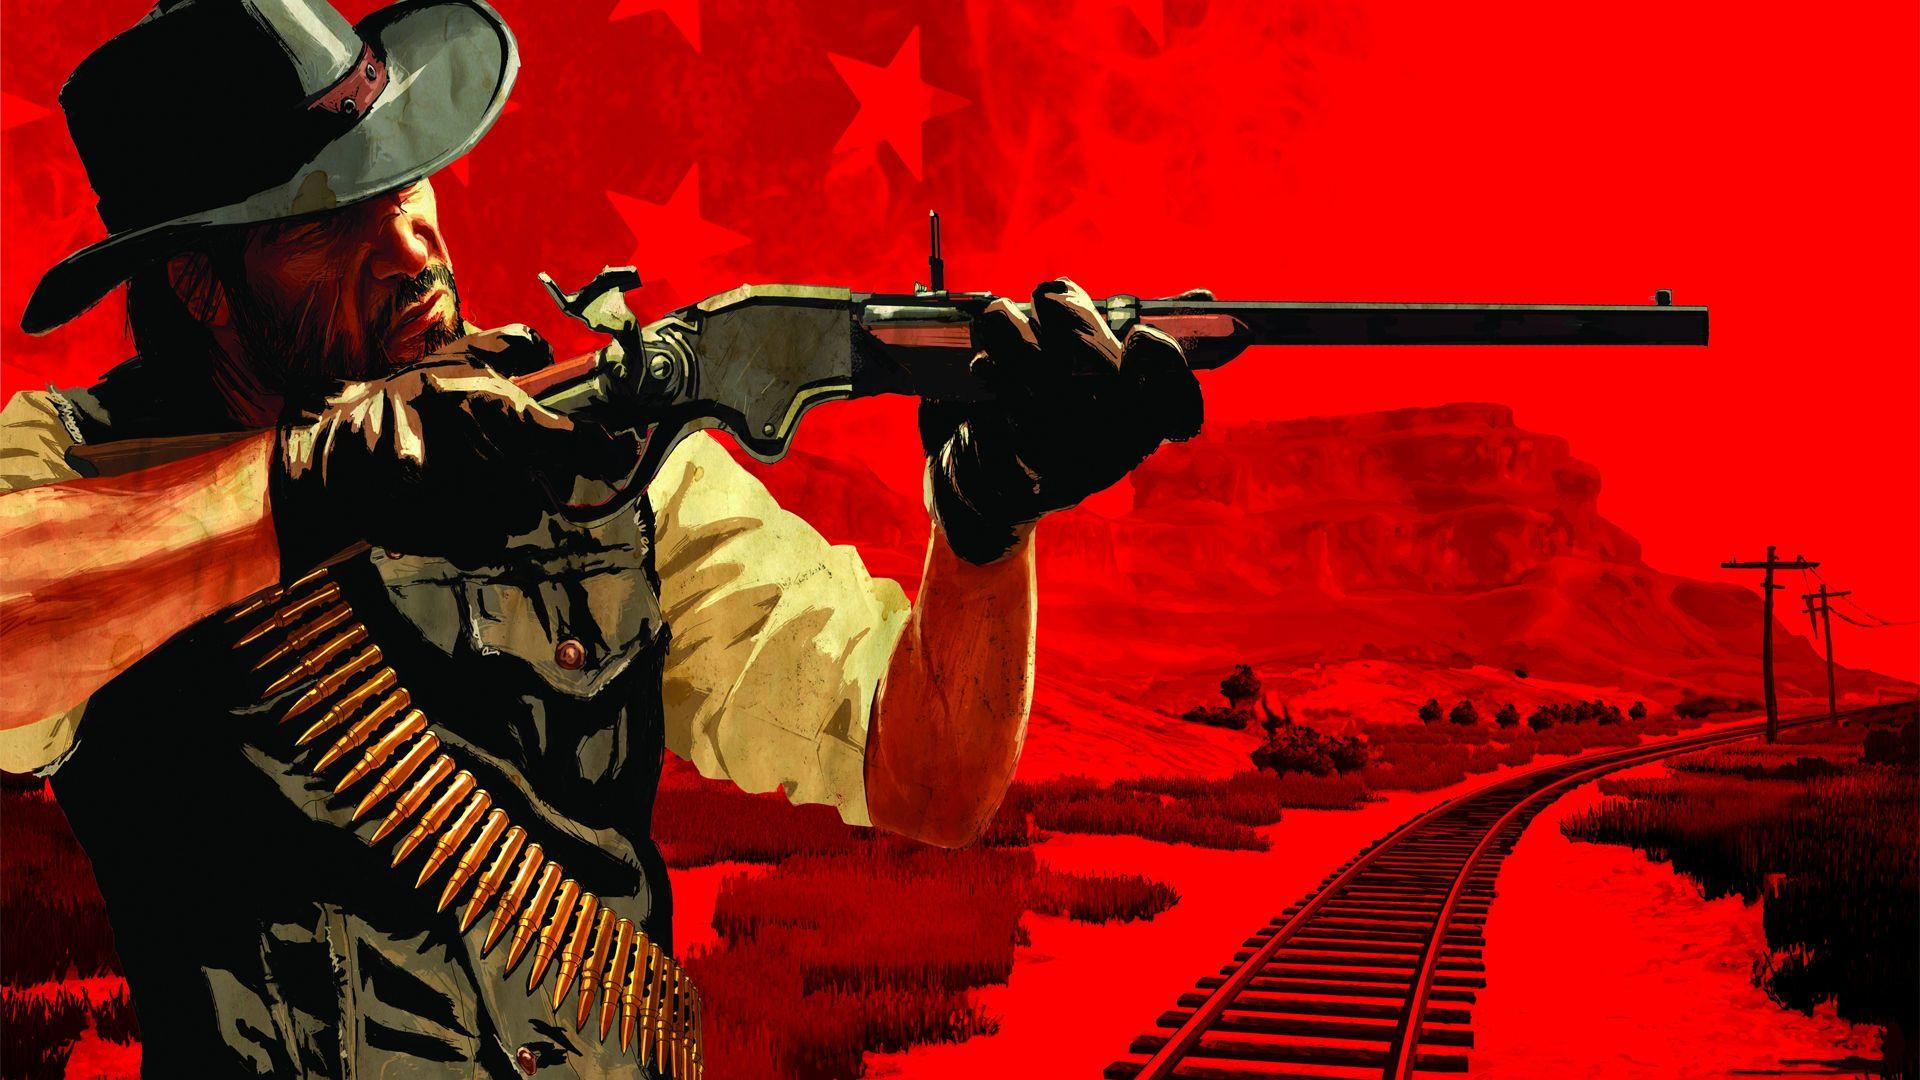 Shotguns Cowboys Wallpaper Red Dead Redemption Artwork Red Dead Redemption Art Red Dead Redemption